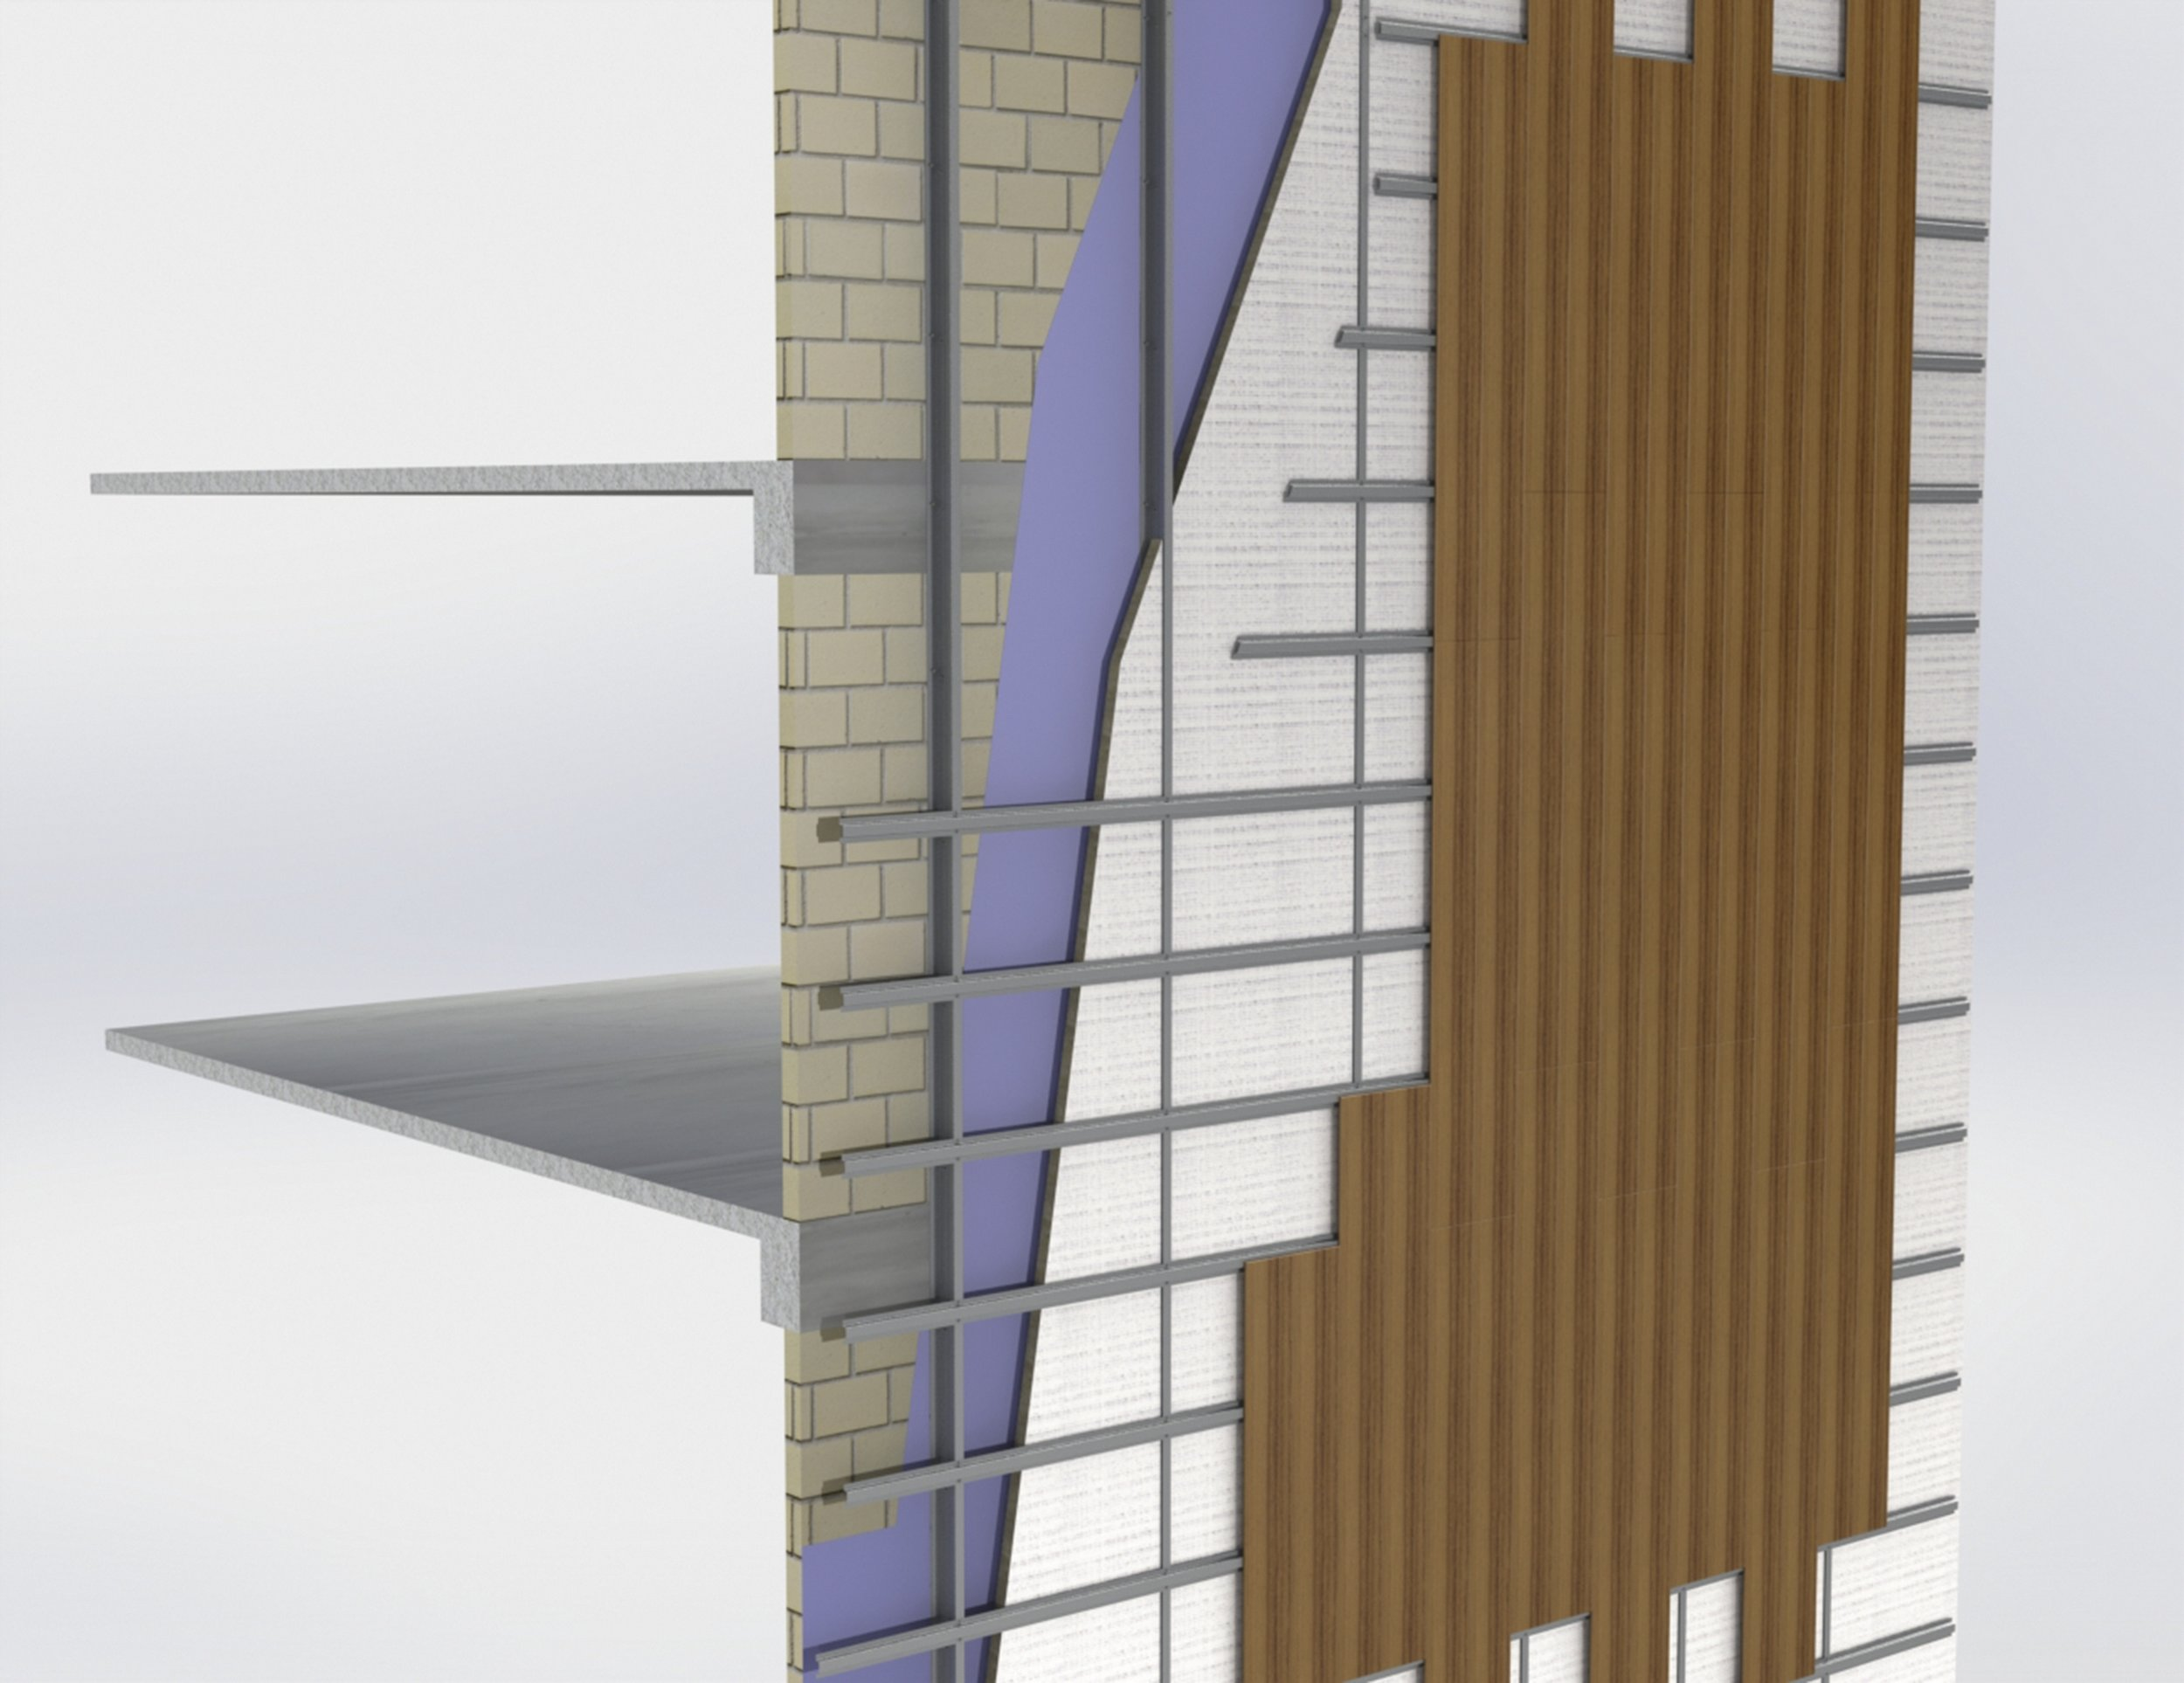 Asse WeatherPlank Concrete masonry blocks 2 C1 teak P.jpg